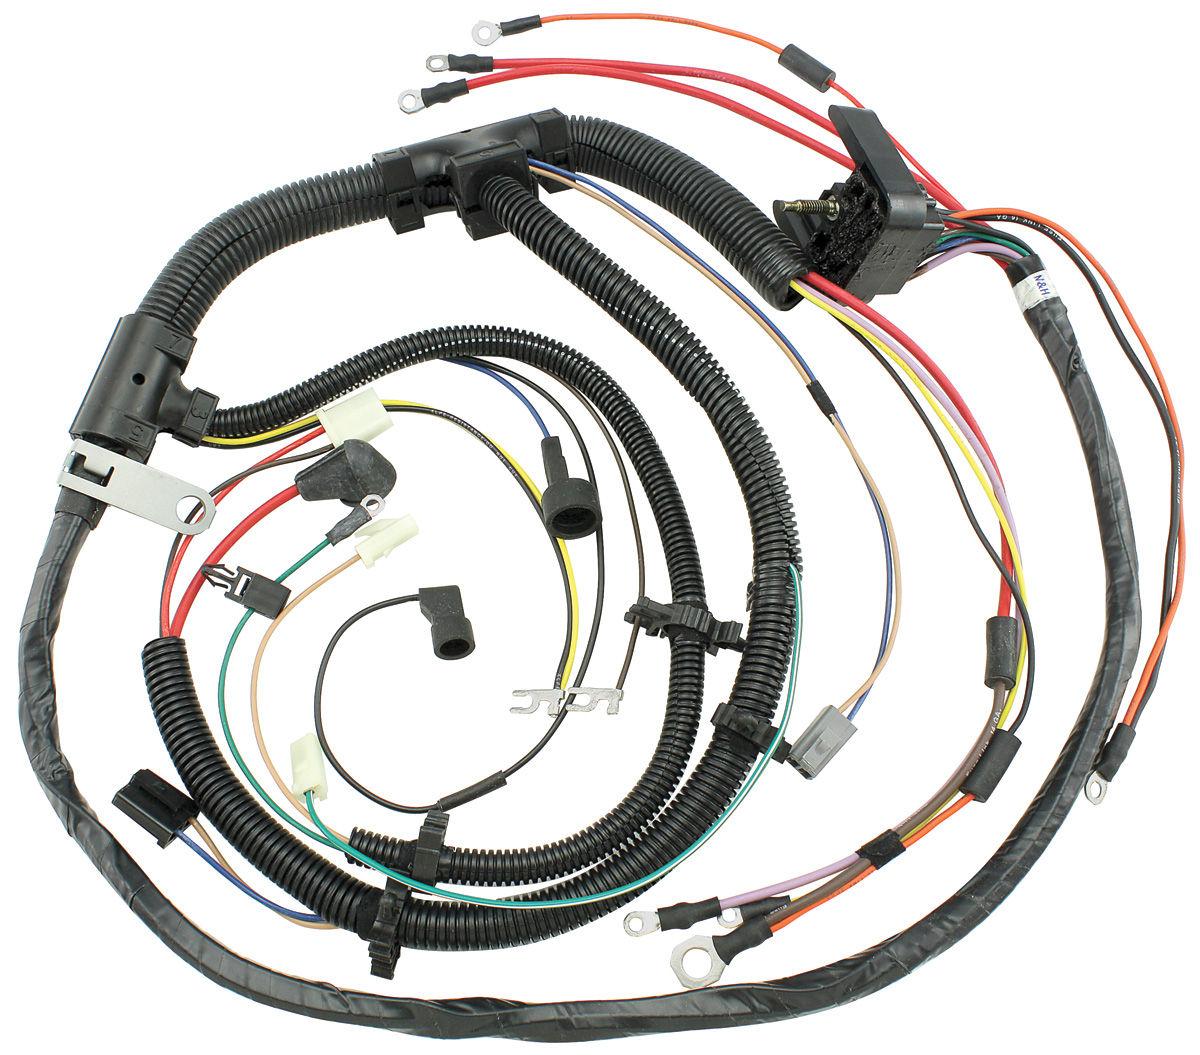 Wiring Harness 1970 El Camino : Cadillac speedometer transmission